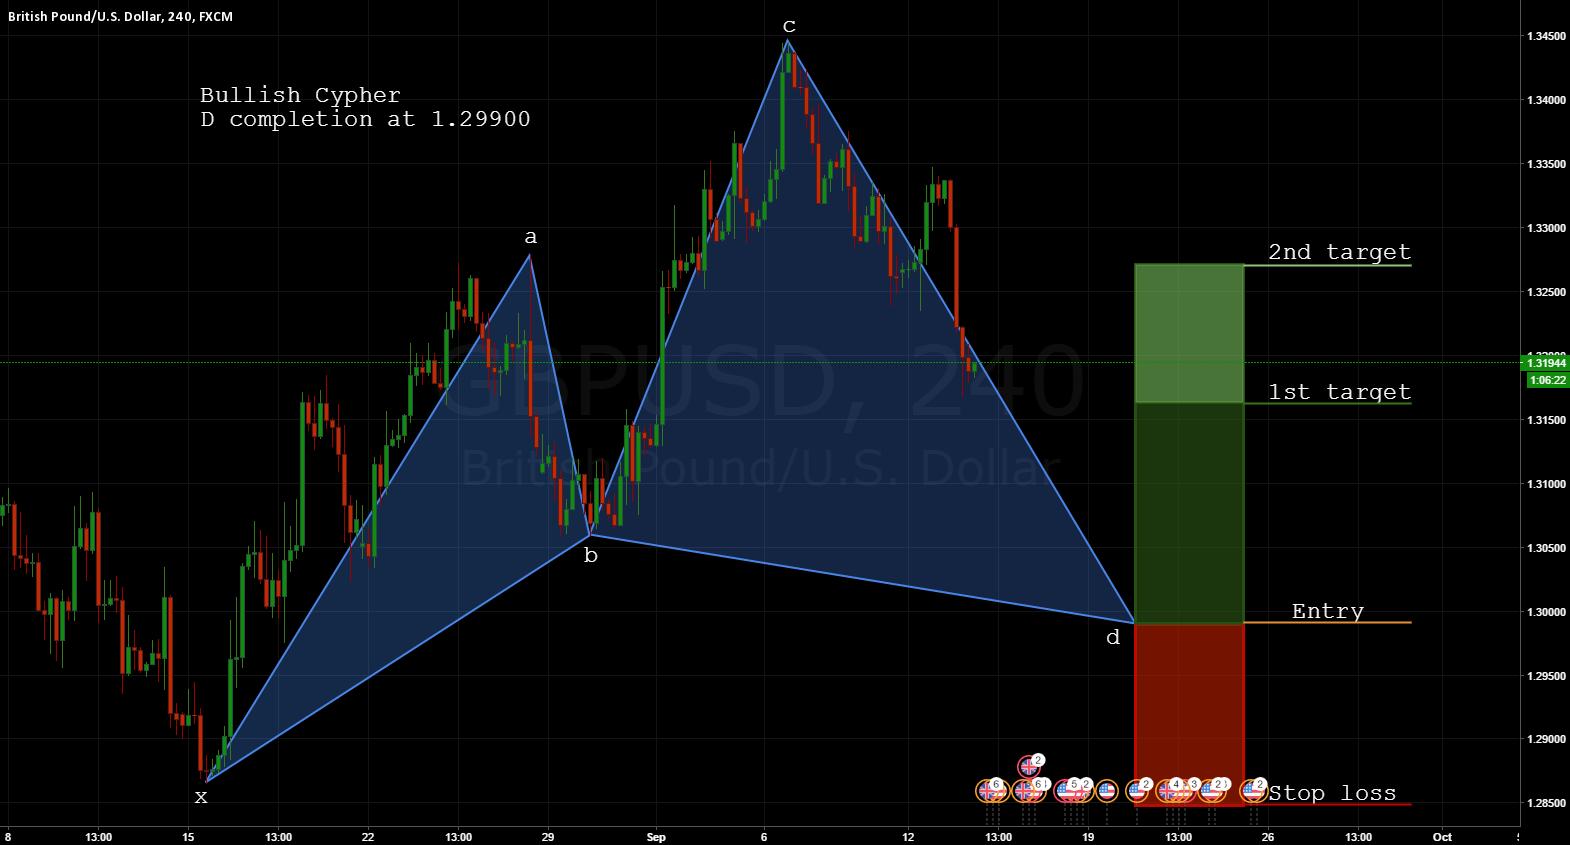 GBPUSD: Buying below 1.30 (Bull Cypher)